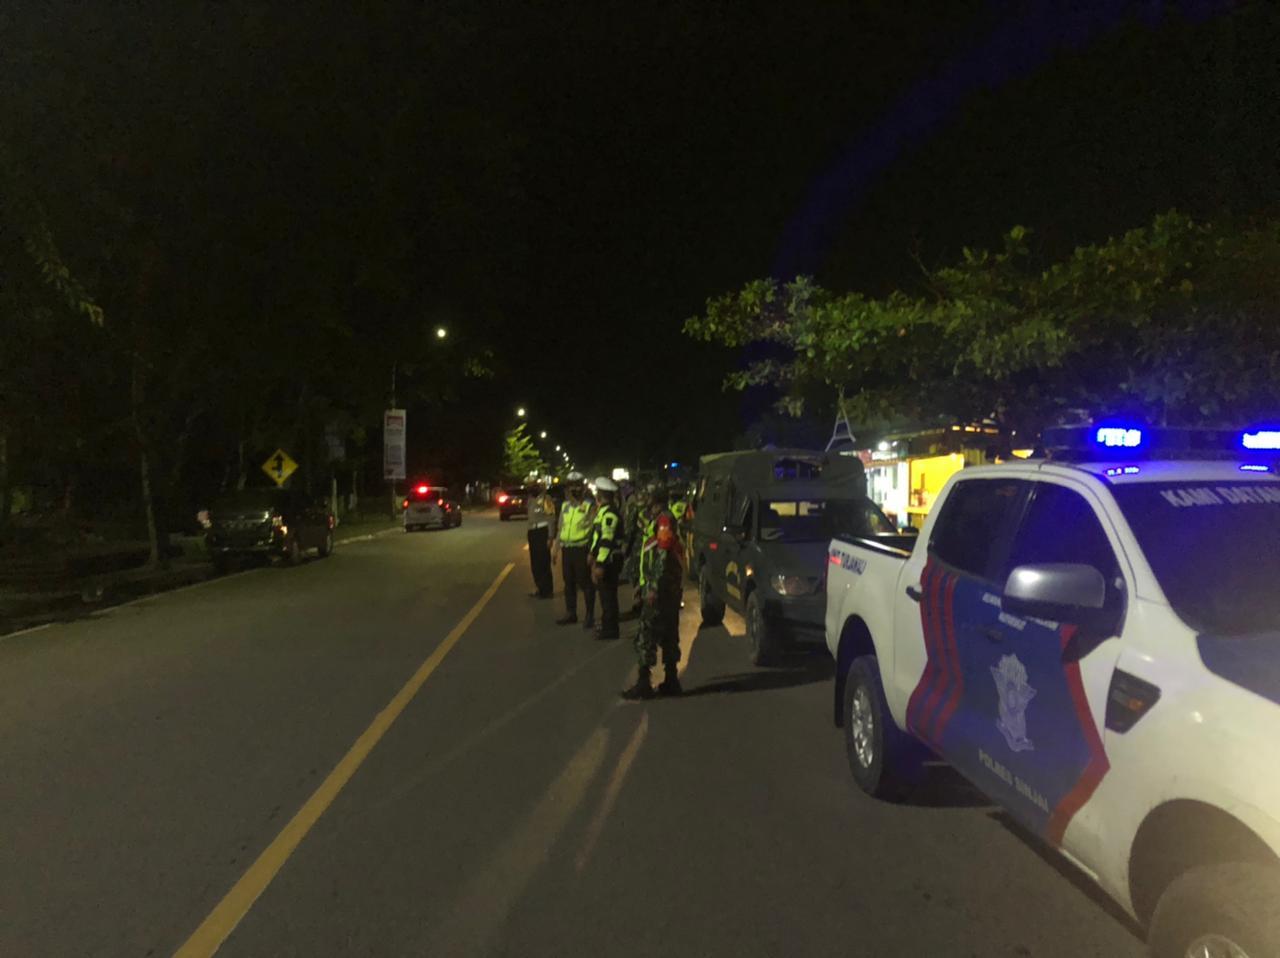 Antisipasi Gangguan Kamtibmas, Polres Sinjai Bersama TNI Gelar Patroli Gabungan